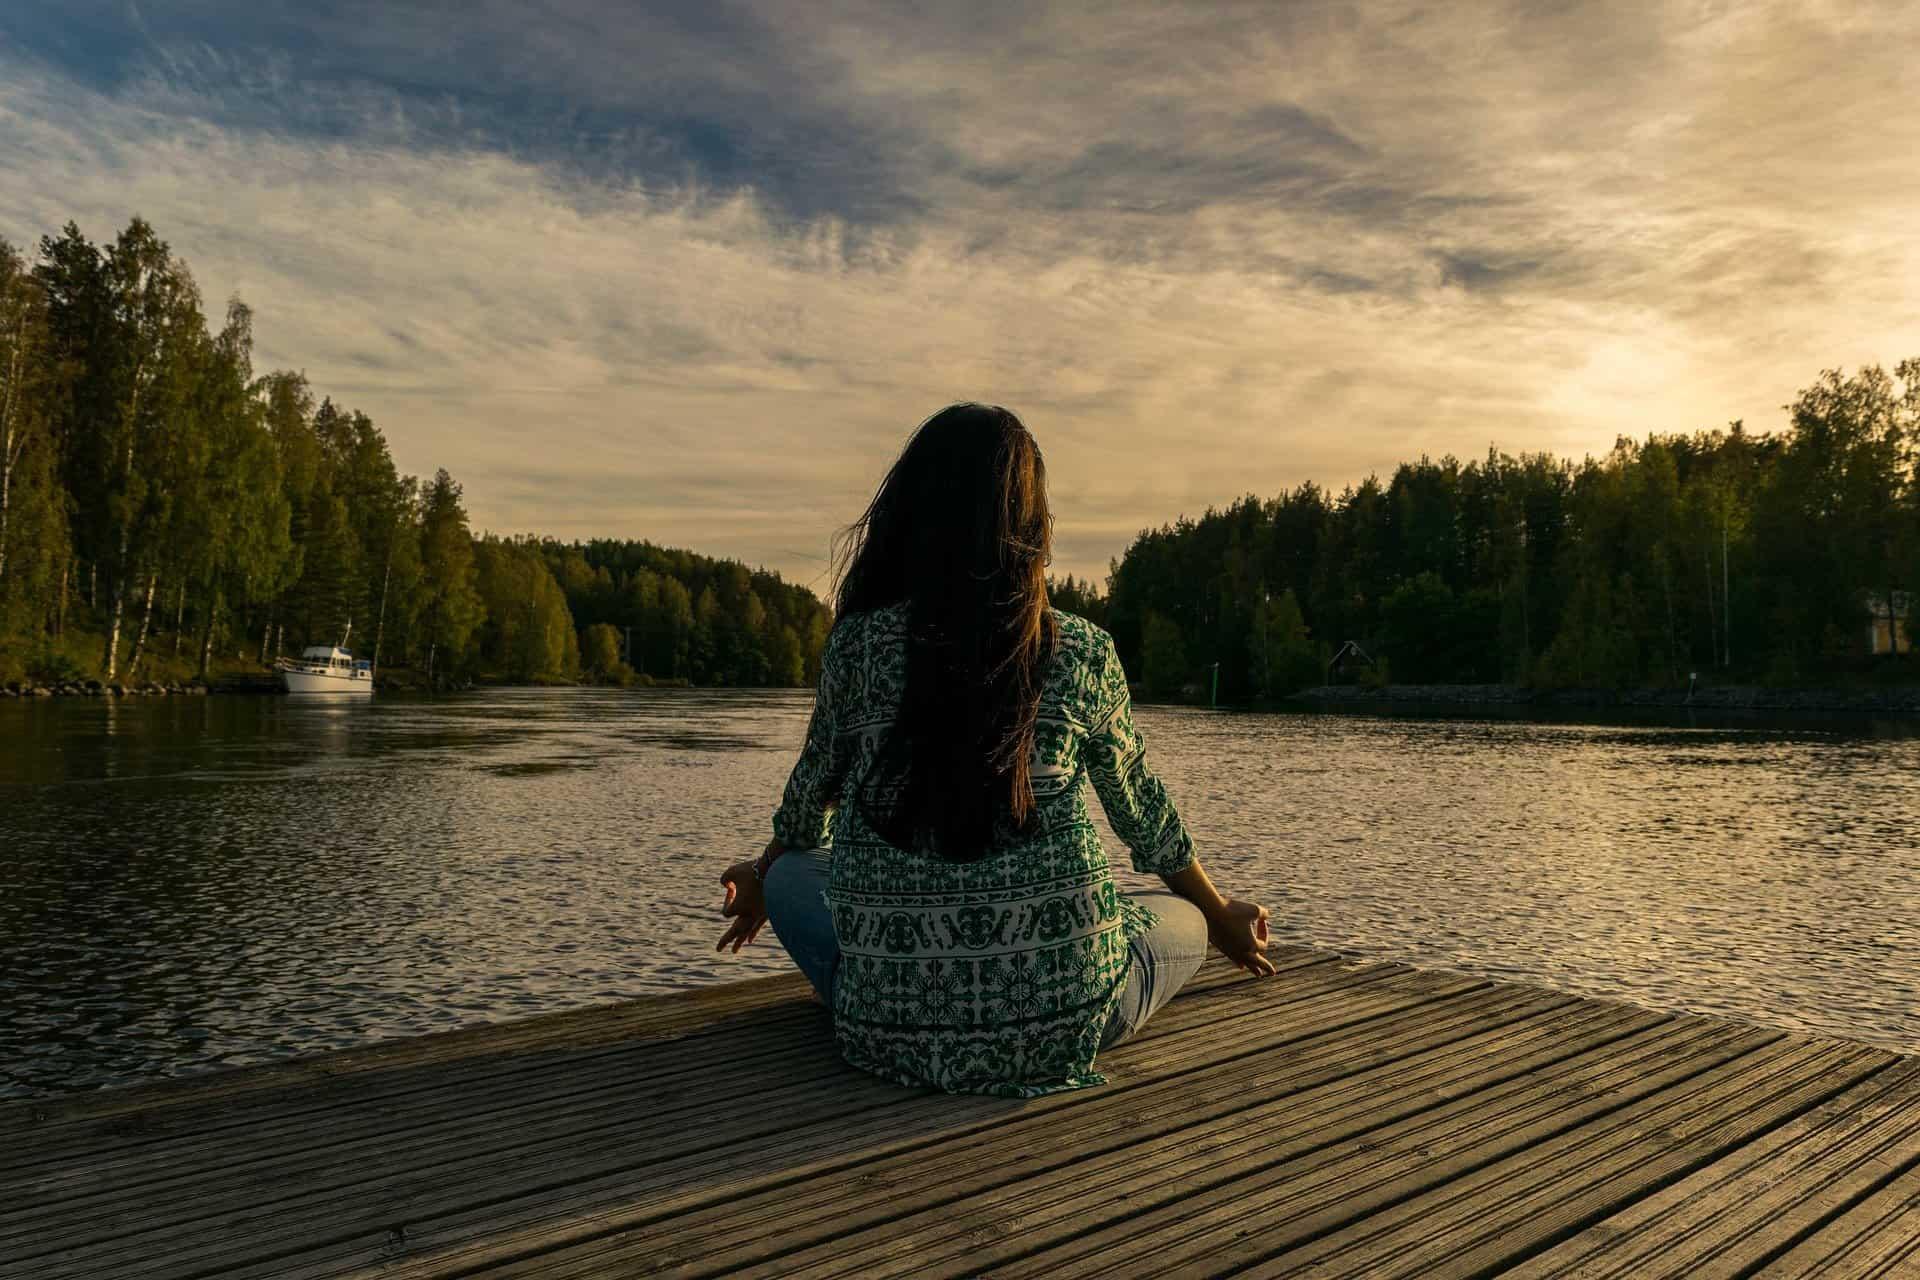 Meditazione cosa è? Ce lo spiega Elena Cei esperta di Yoga e meditazione